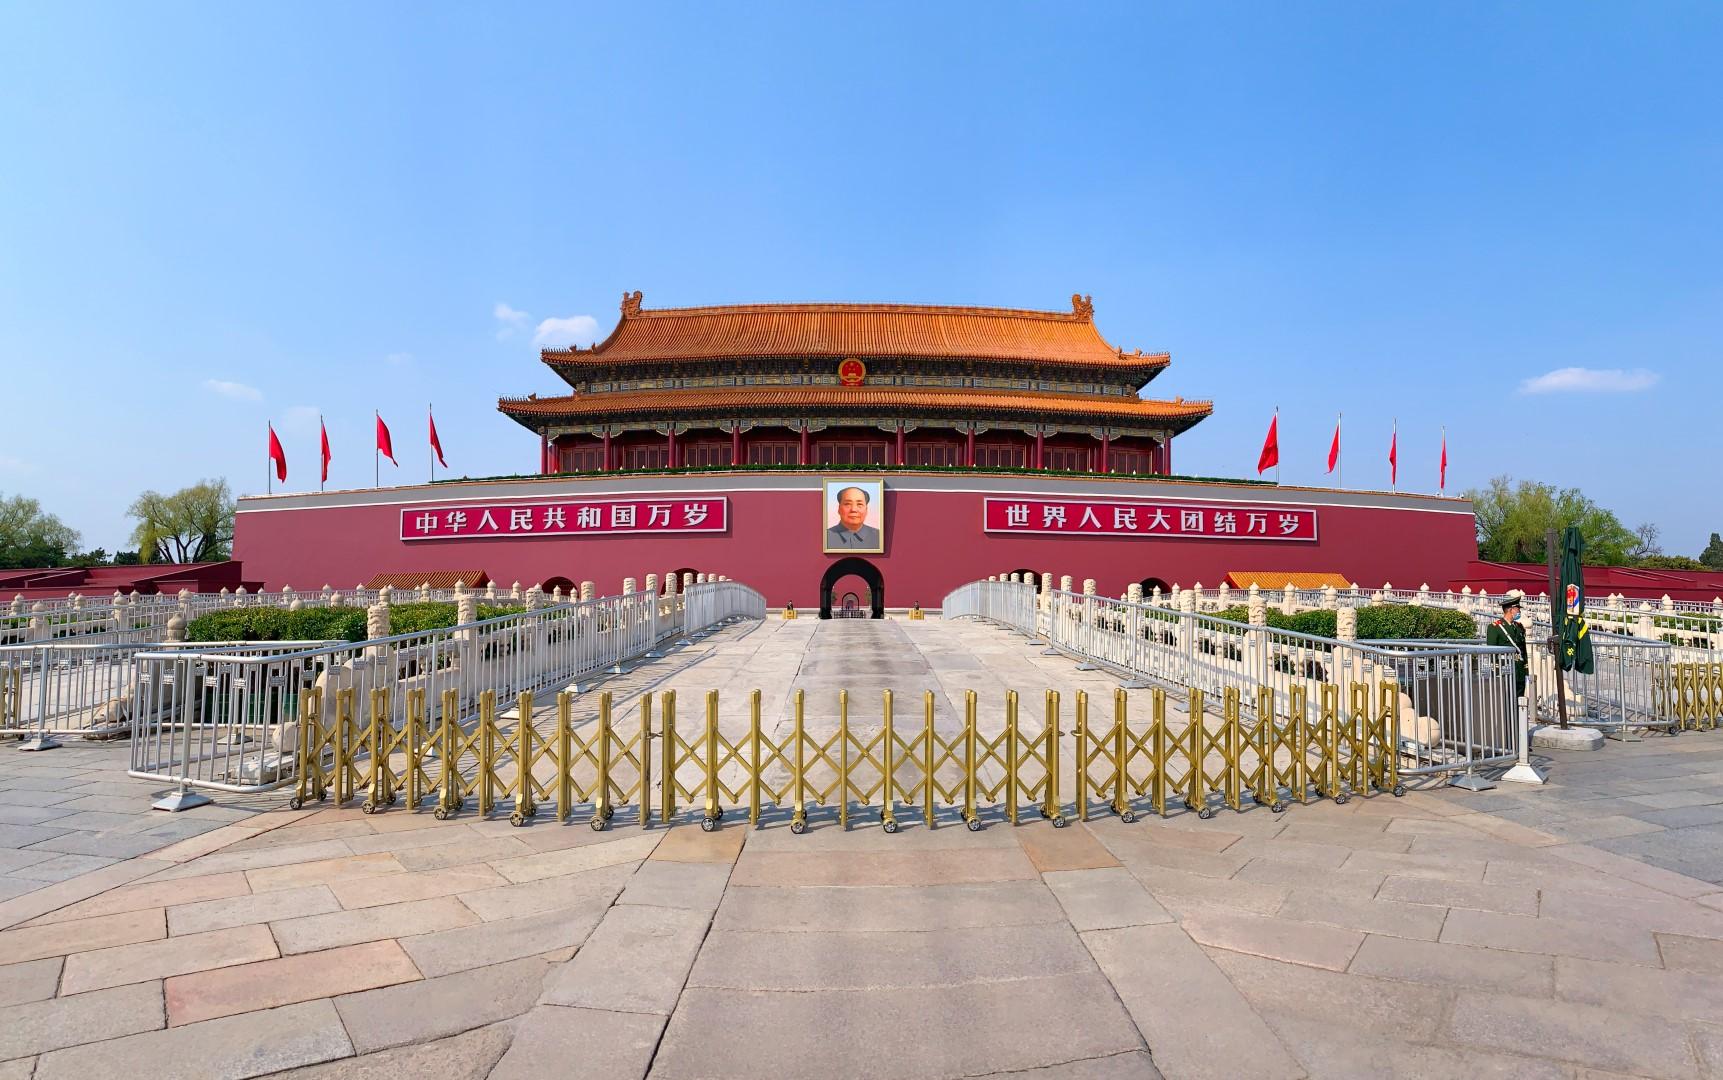 Beijing - April 10 Tiananmen Gate Tower on April 10  2020 in Beijing, China